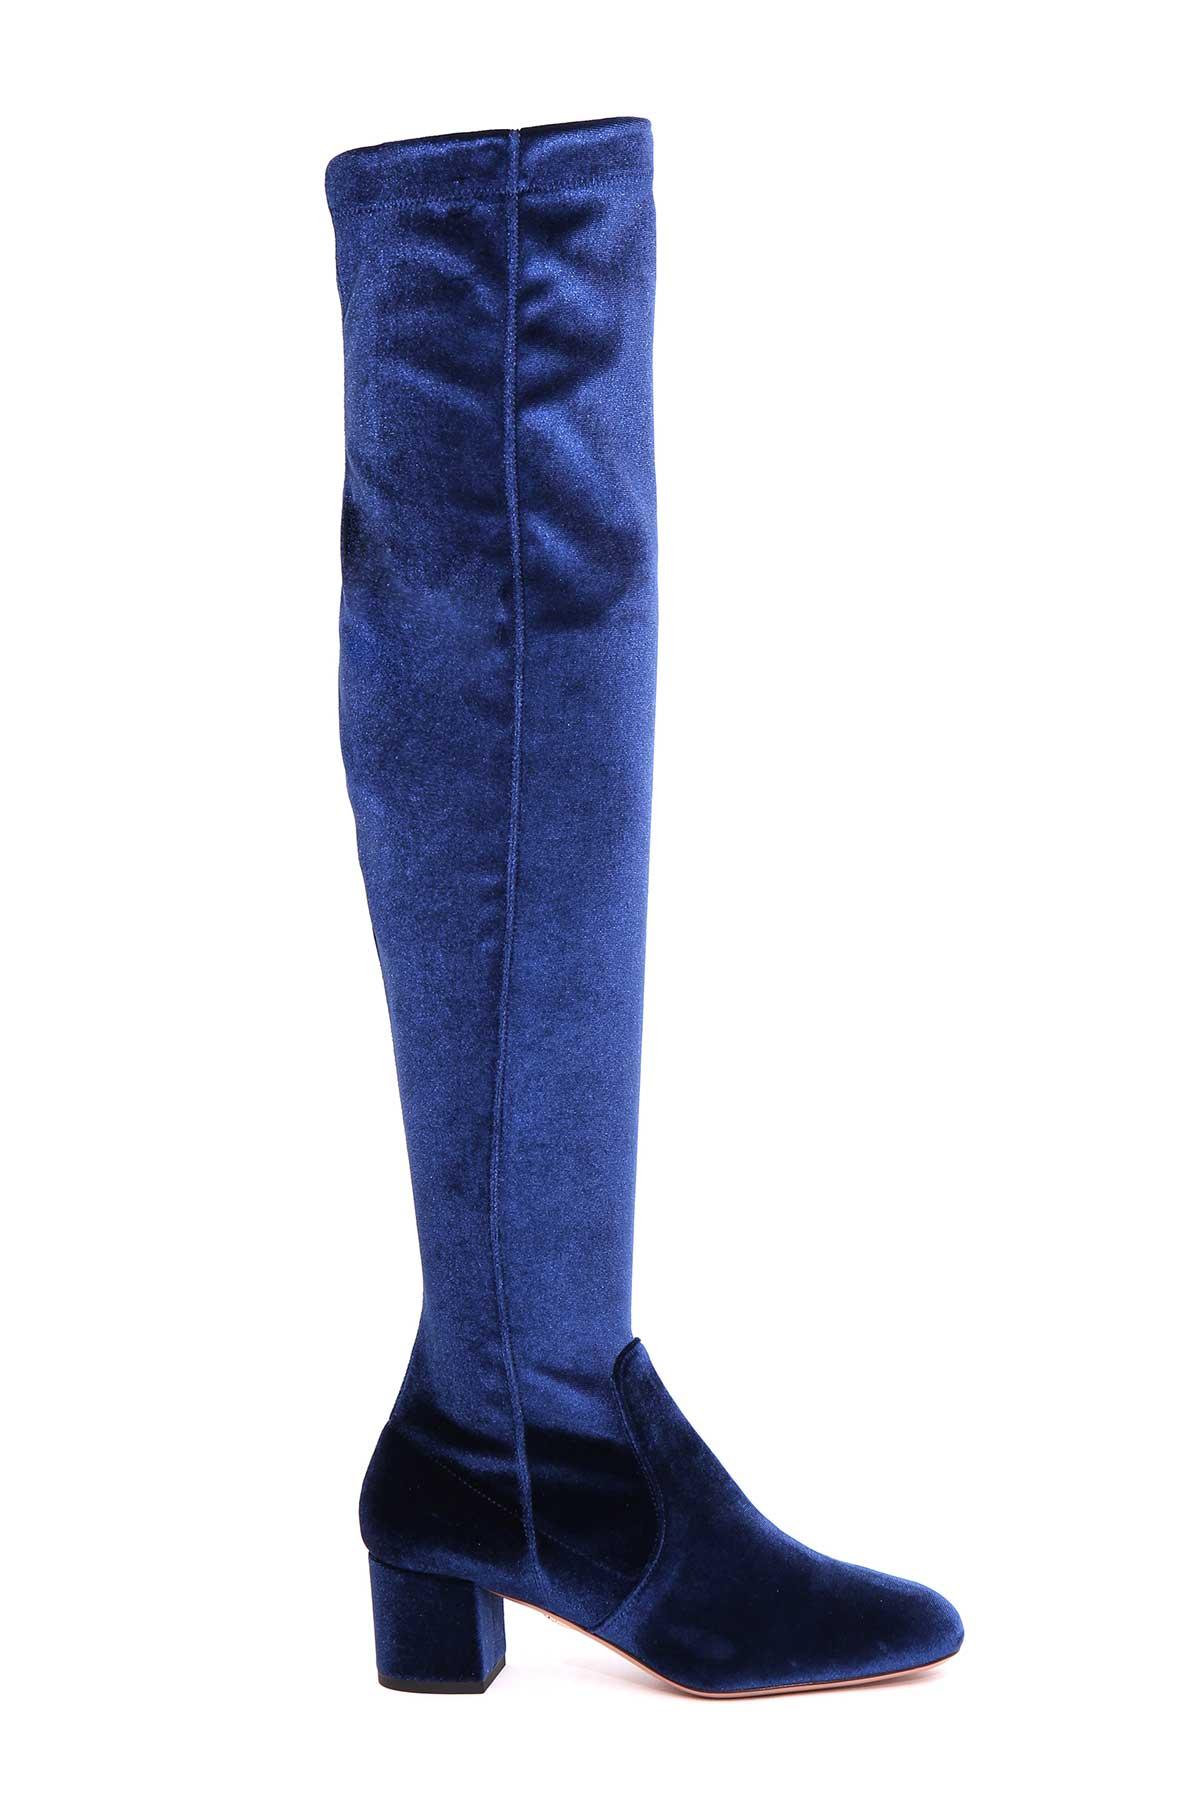 Aquazzura Essence Velvet Boot 8953066